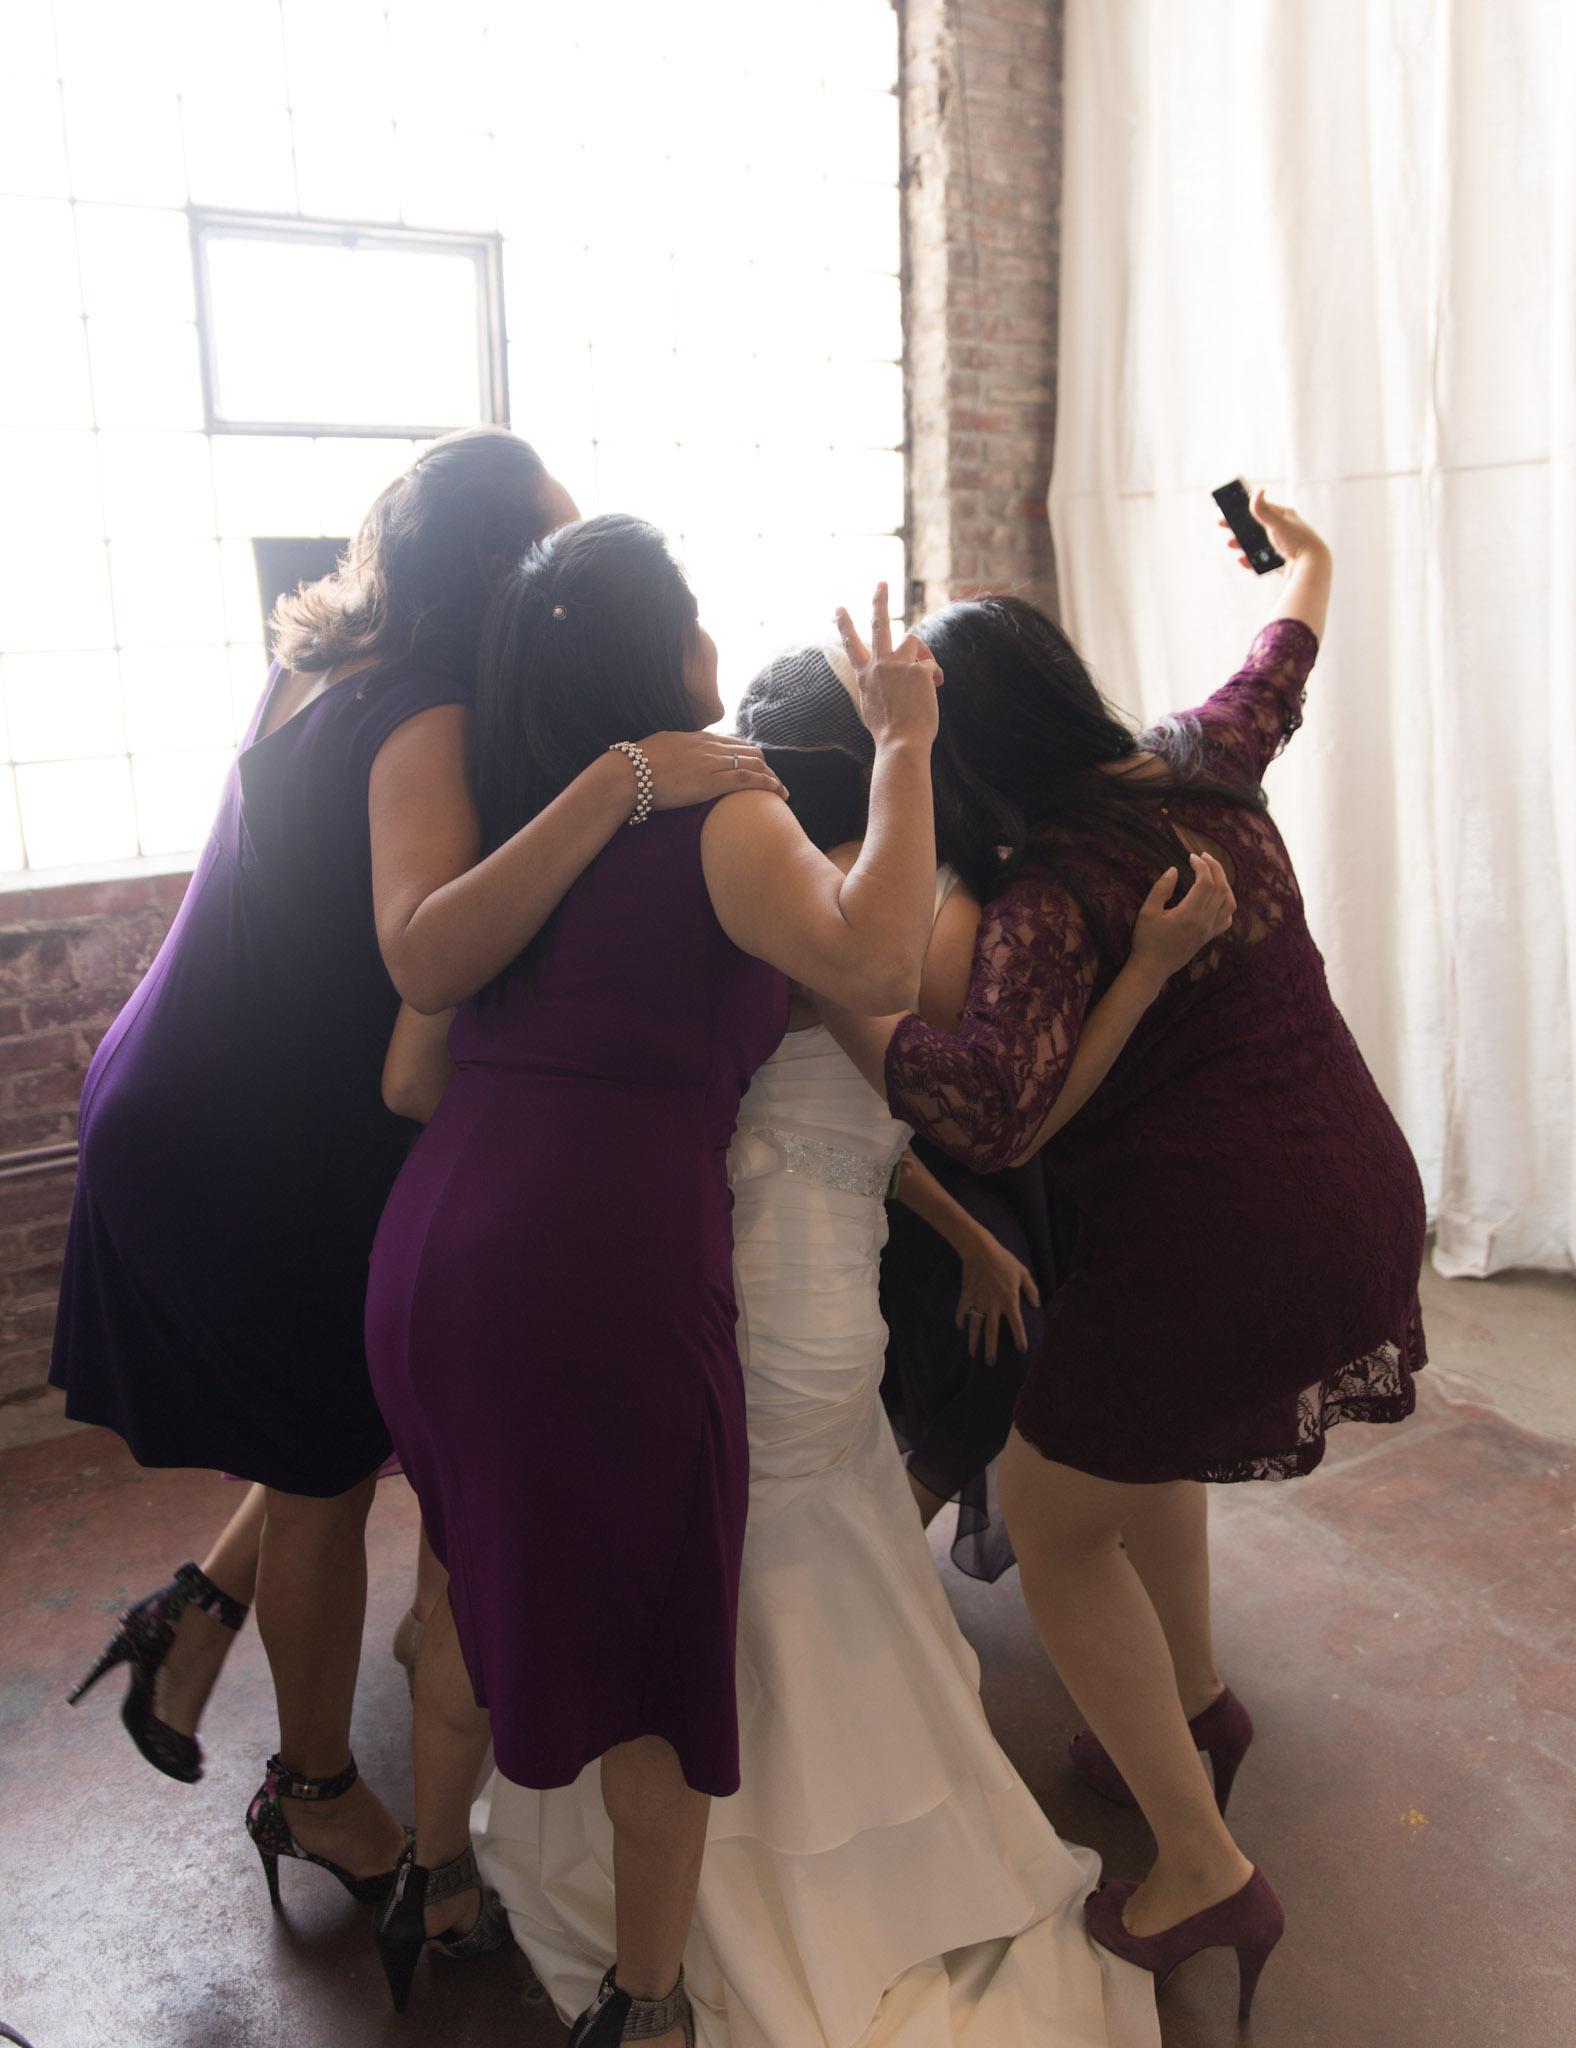 Kansas_City_Small_Wedding_Venue_Elope_Intimate_Ceremony_Budget_Affordable_TVX_Z&B_6.27.15_141.jpg